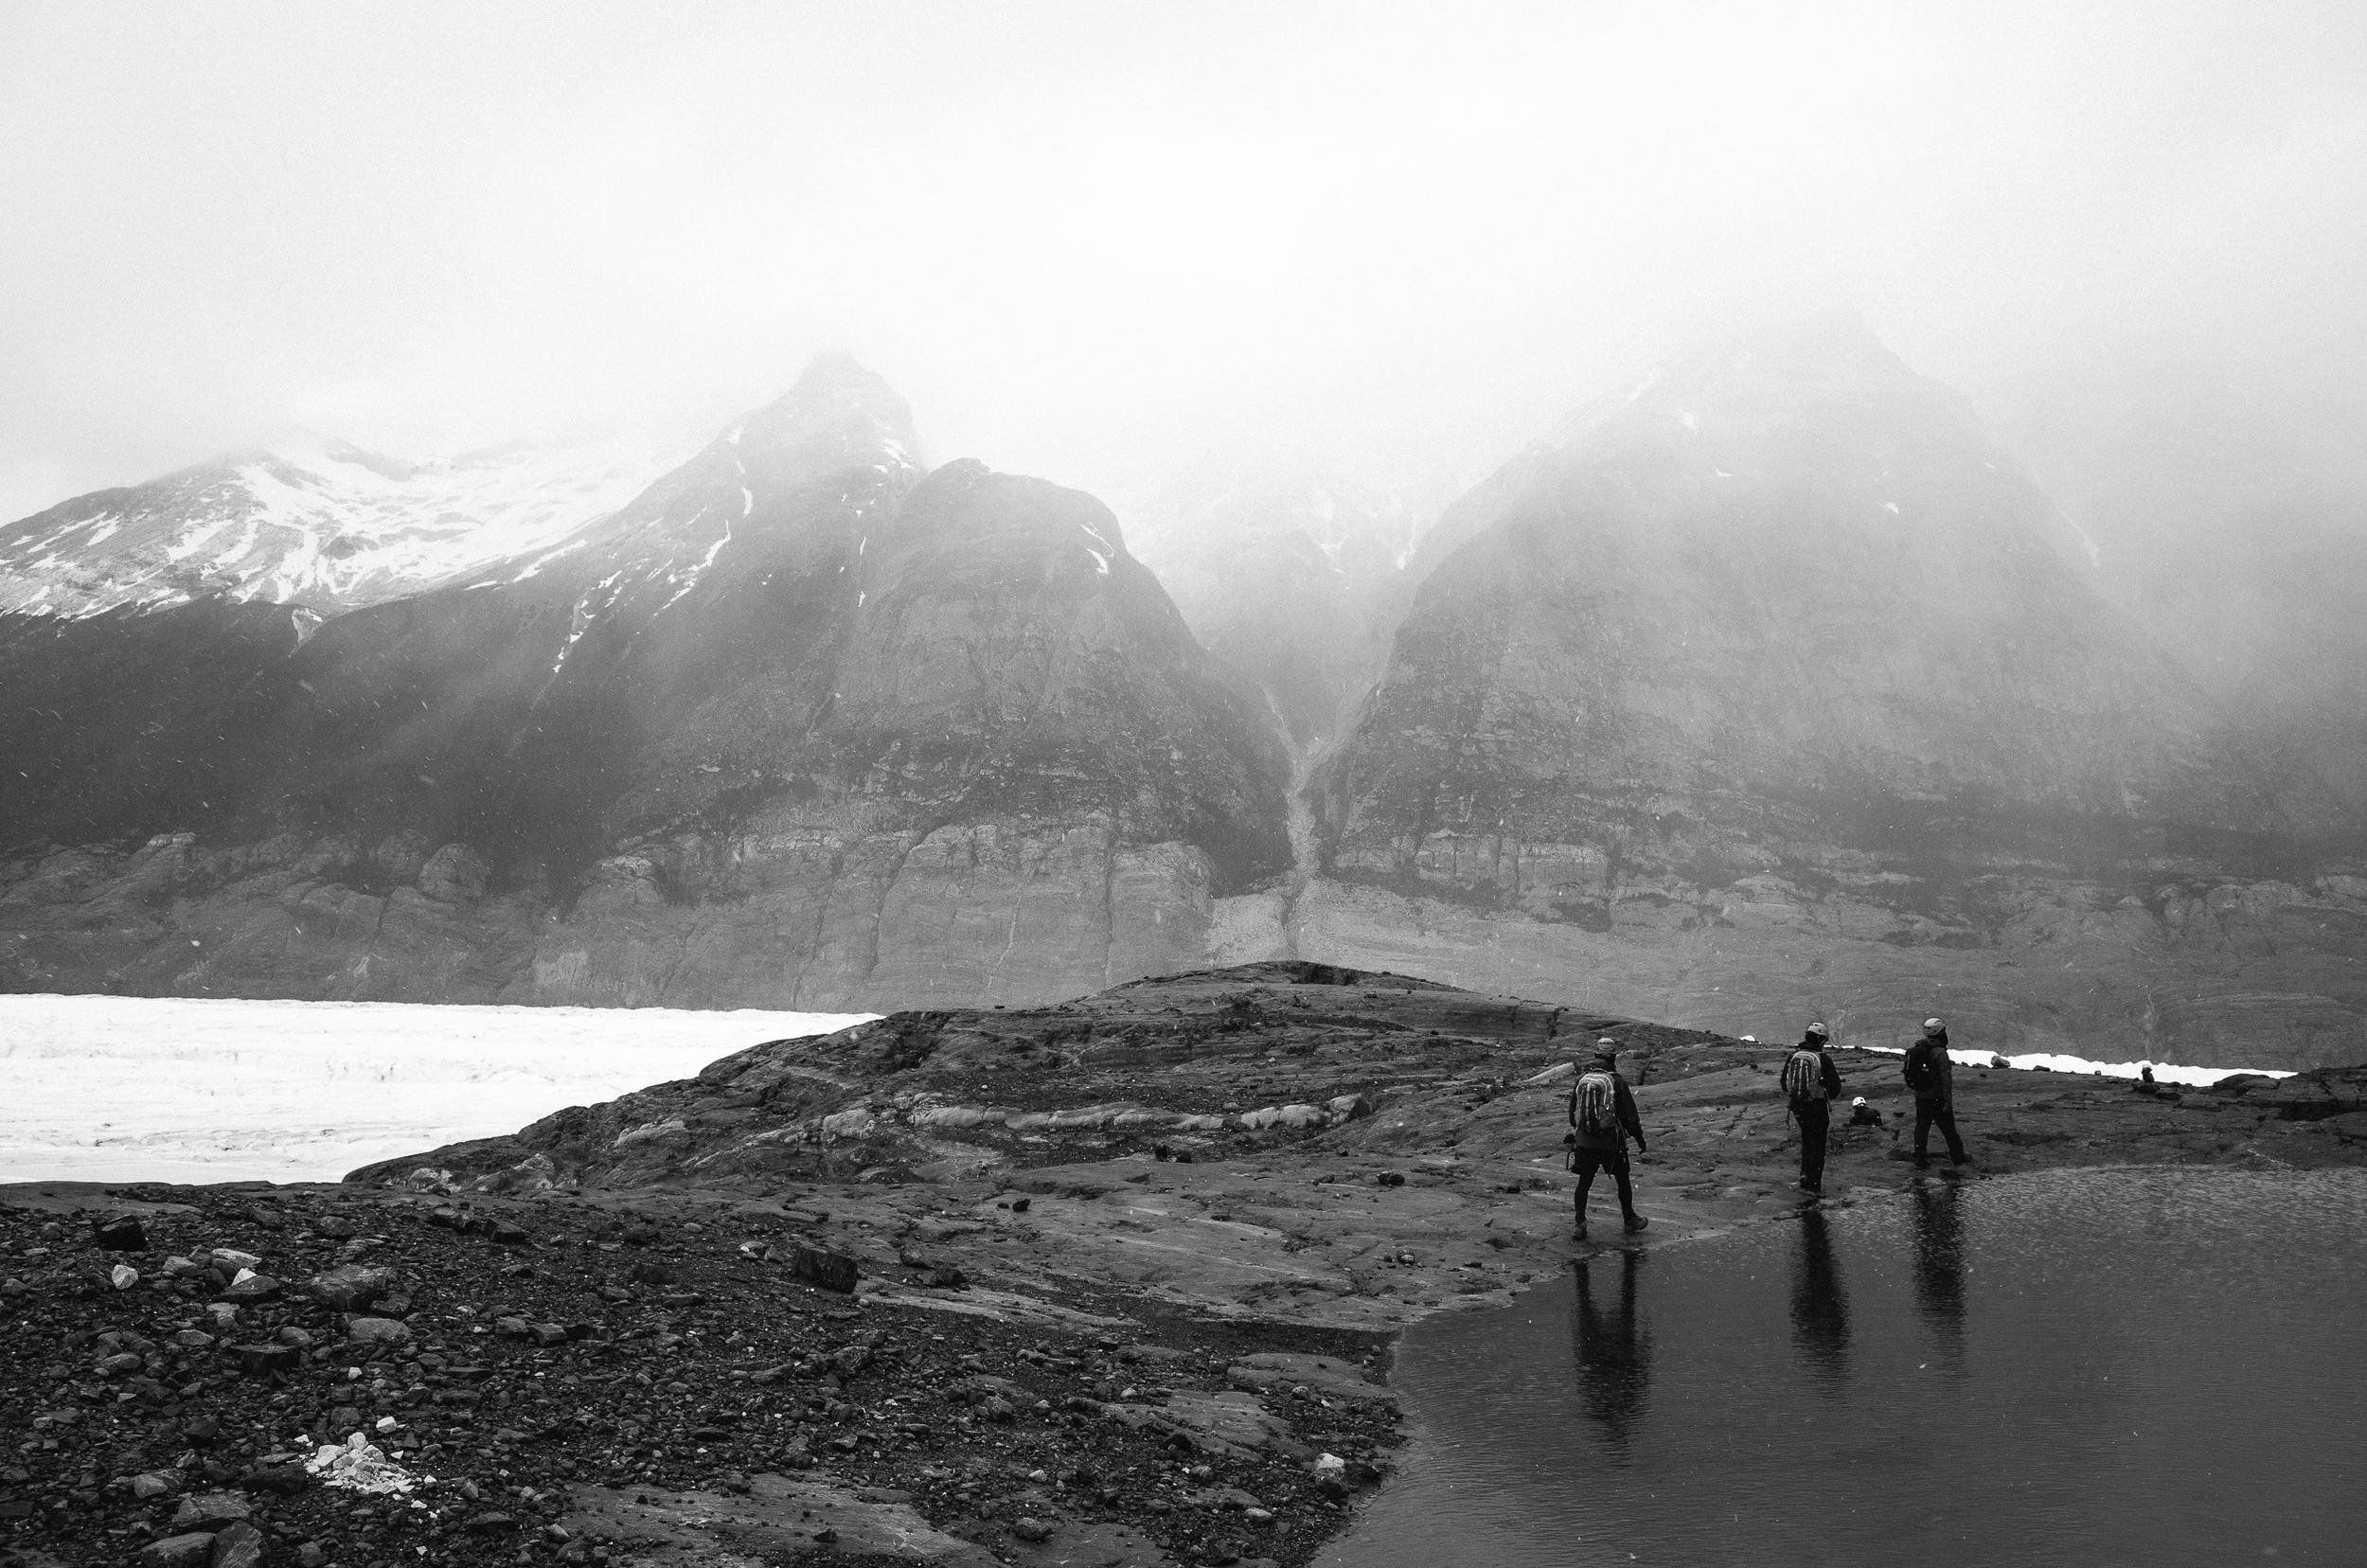 patagonia-11.jpg